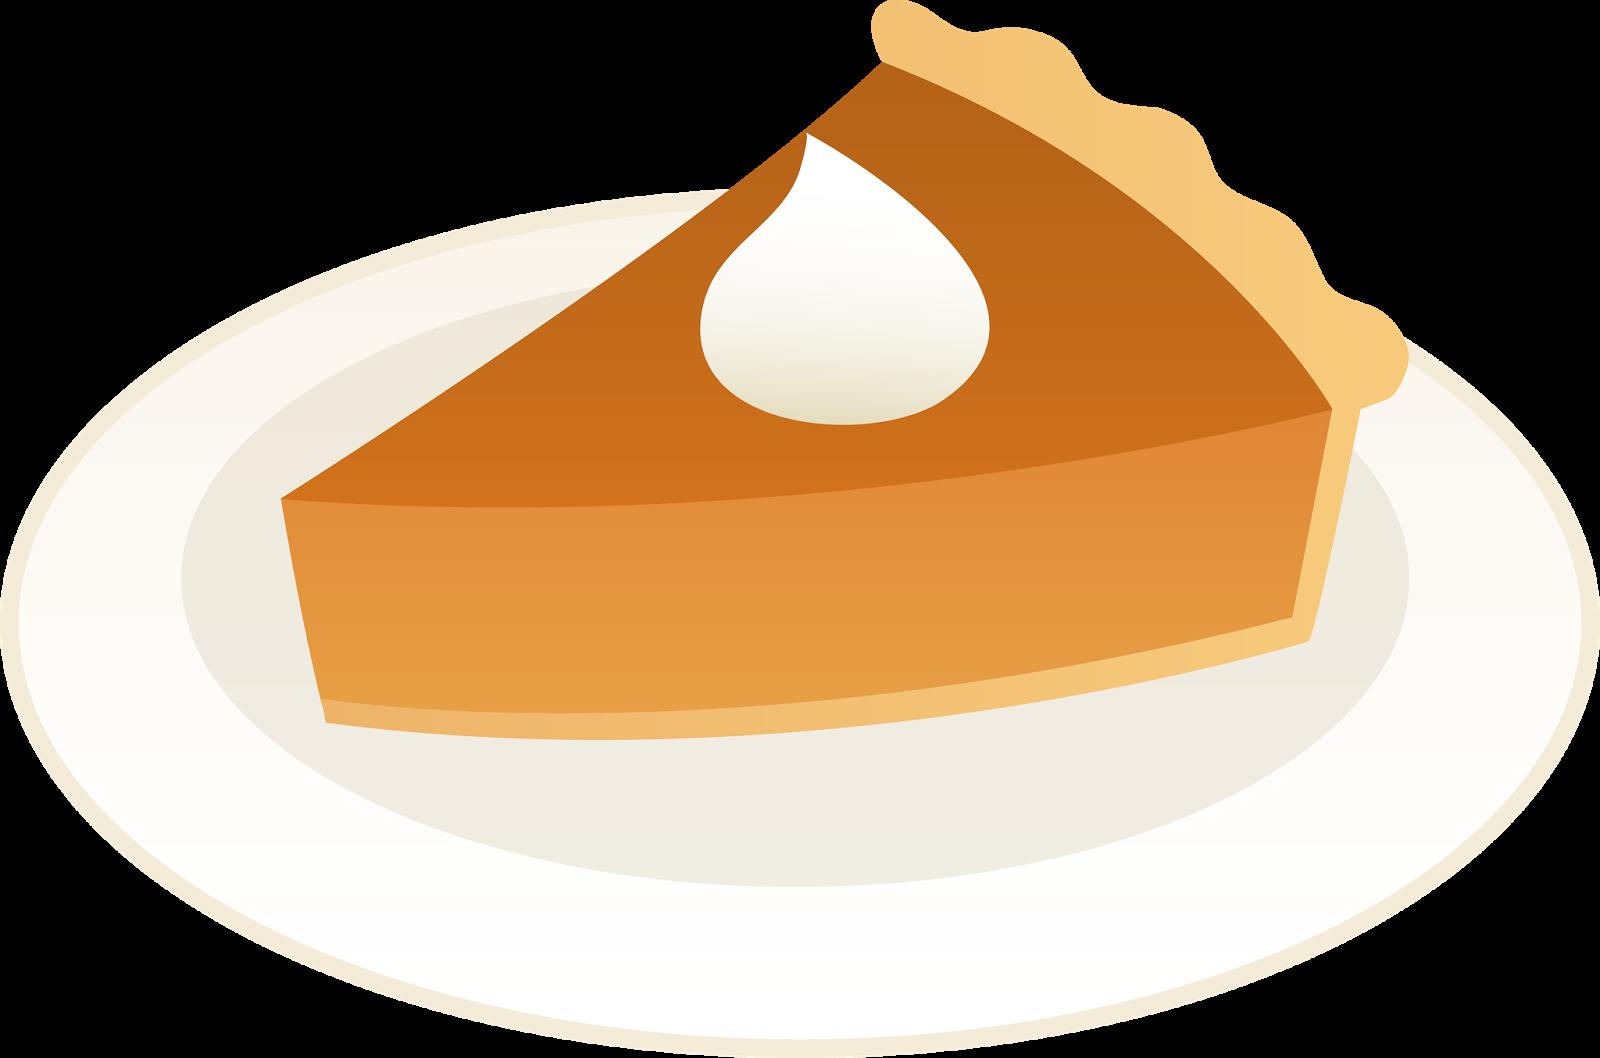 Pumpkin pi math clipart image free download Pumpkin pi math clipart - ClipartFest image free download